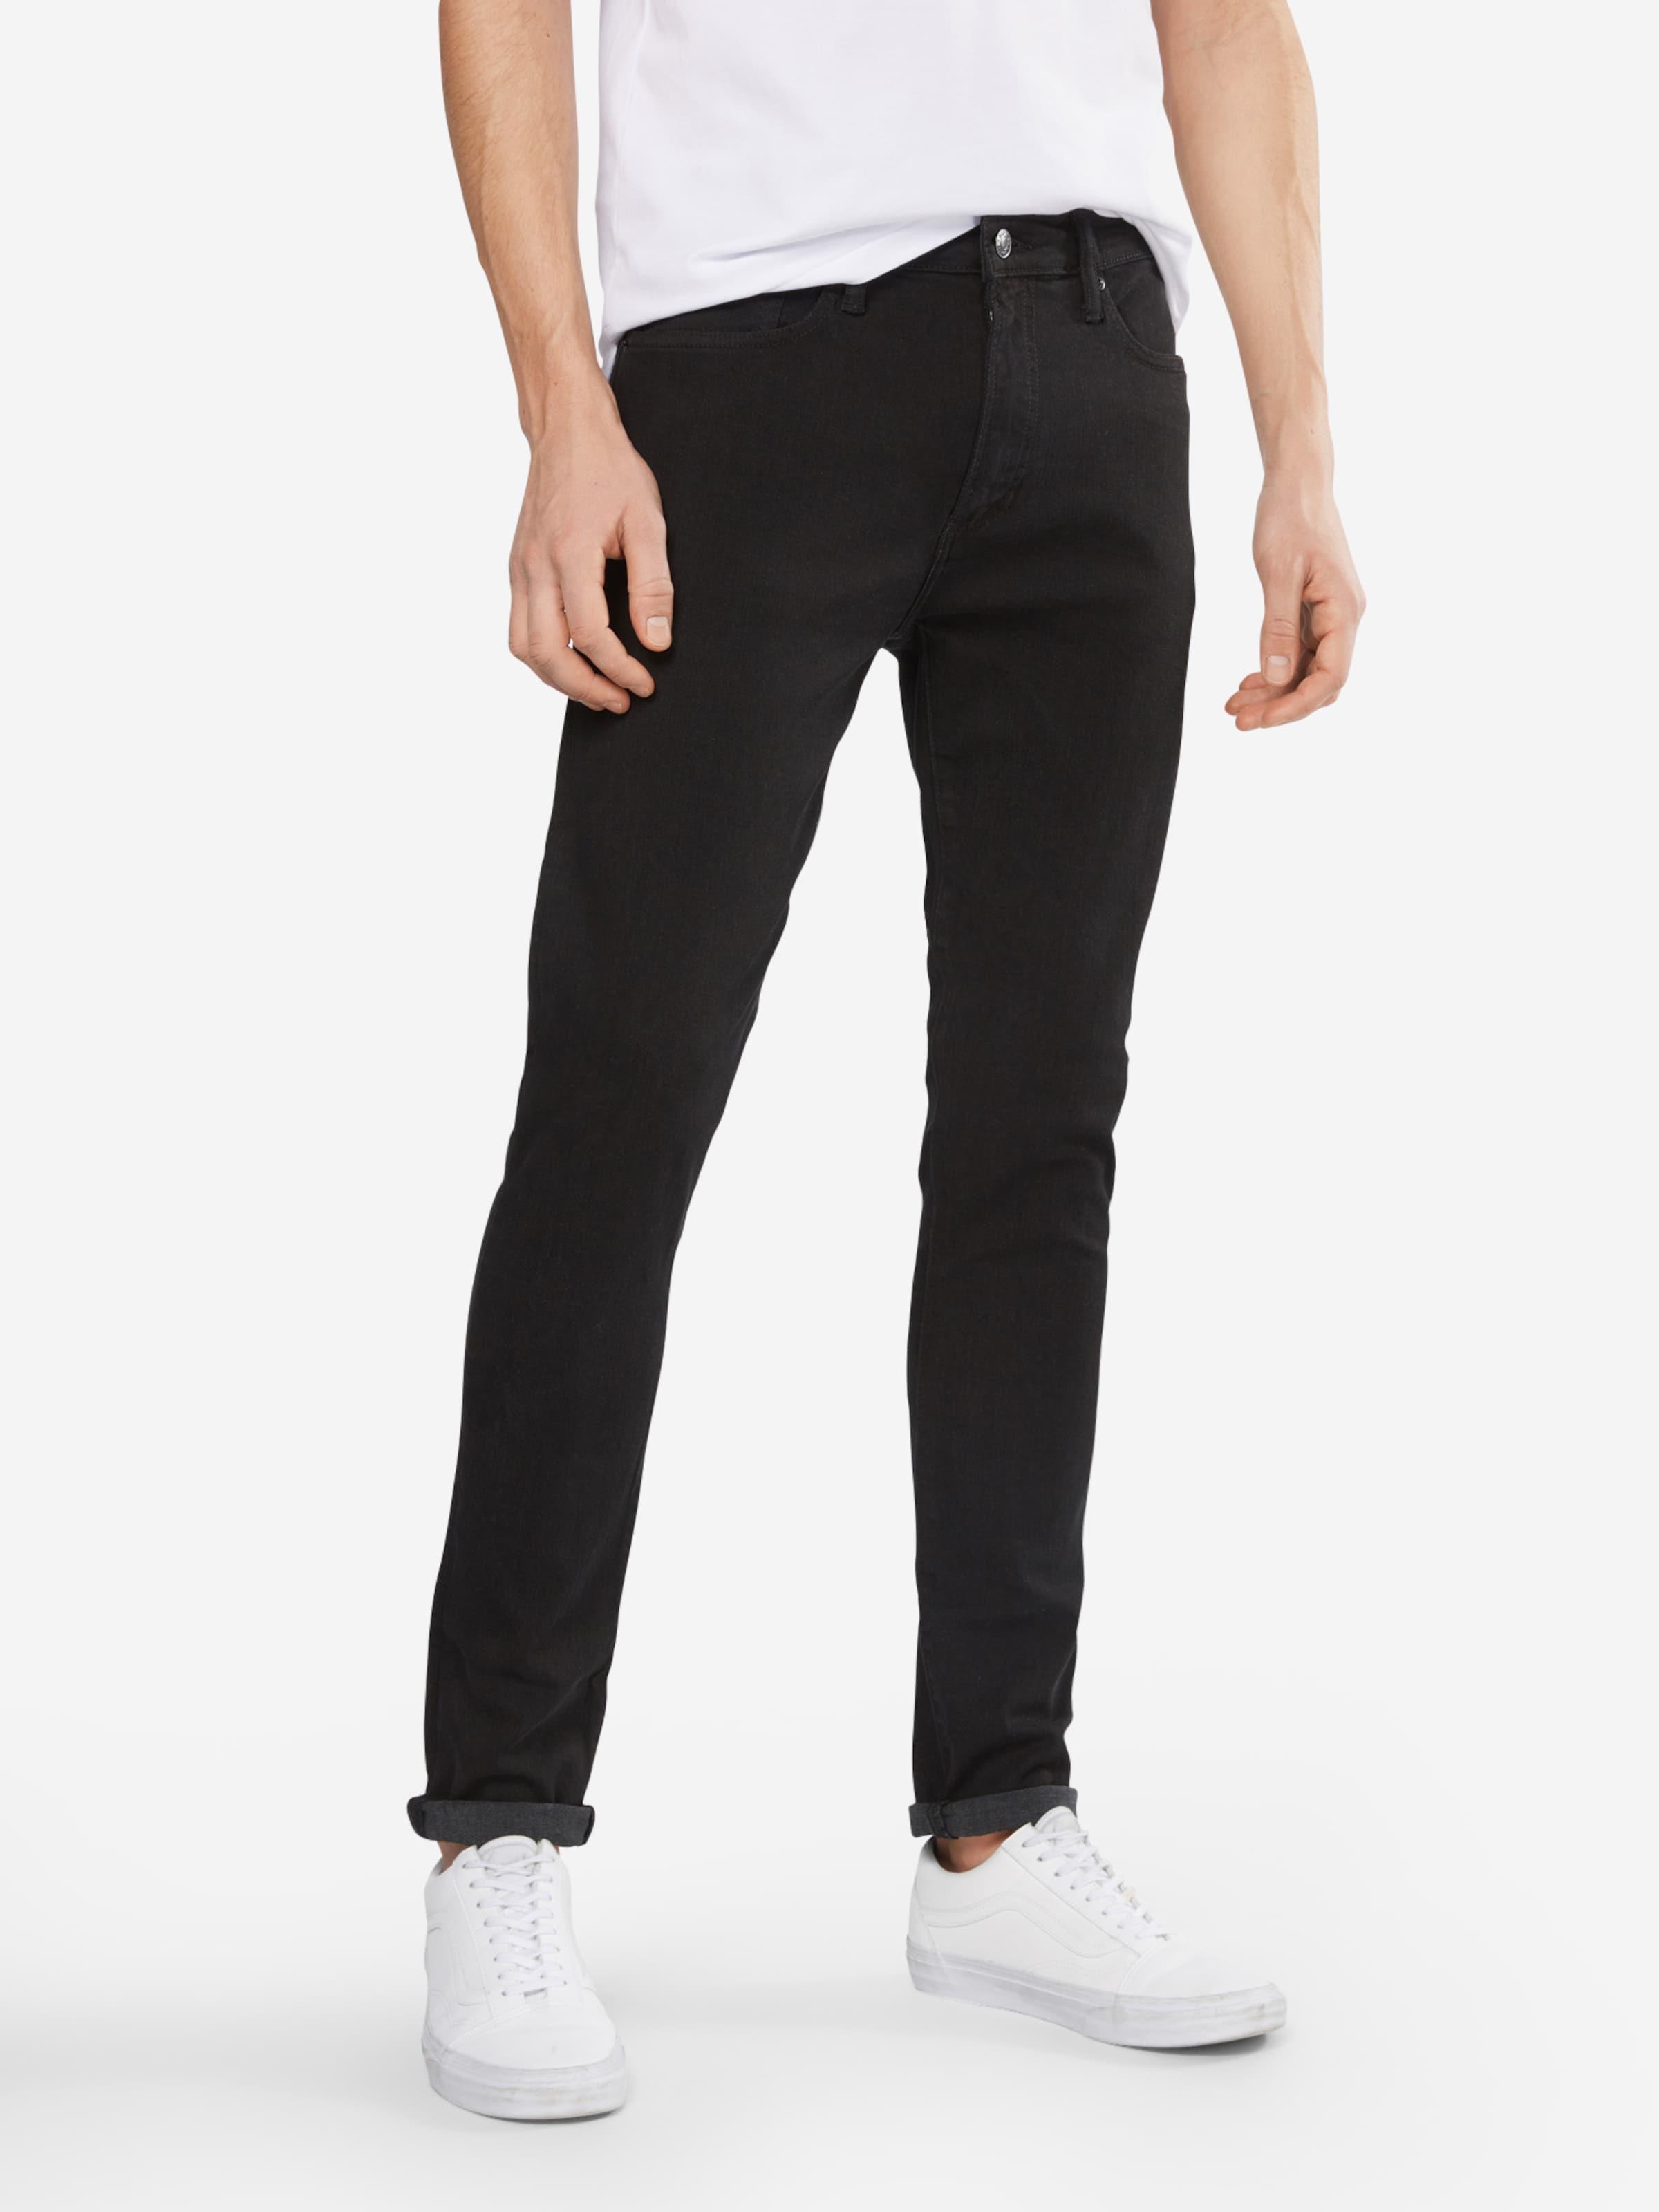 In Jeans Denim Gap Black hQxtsrdC